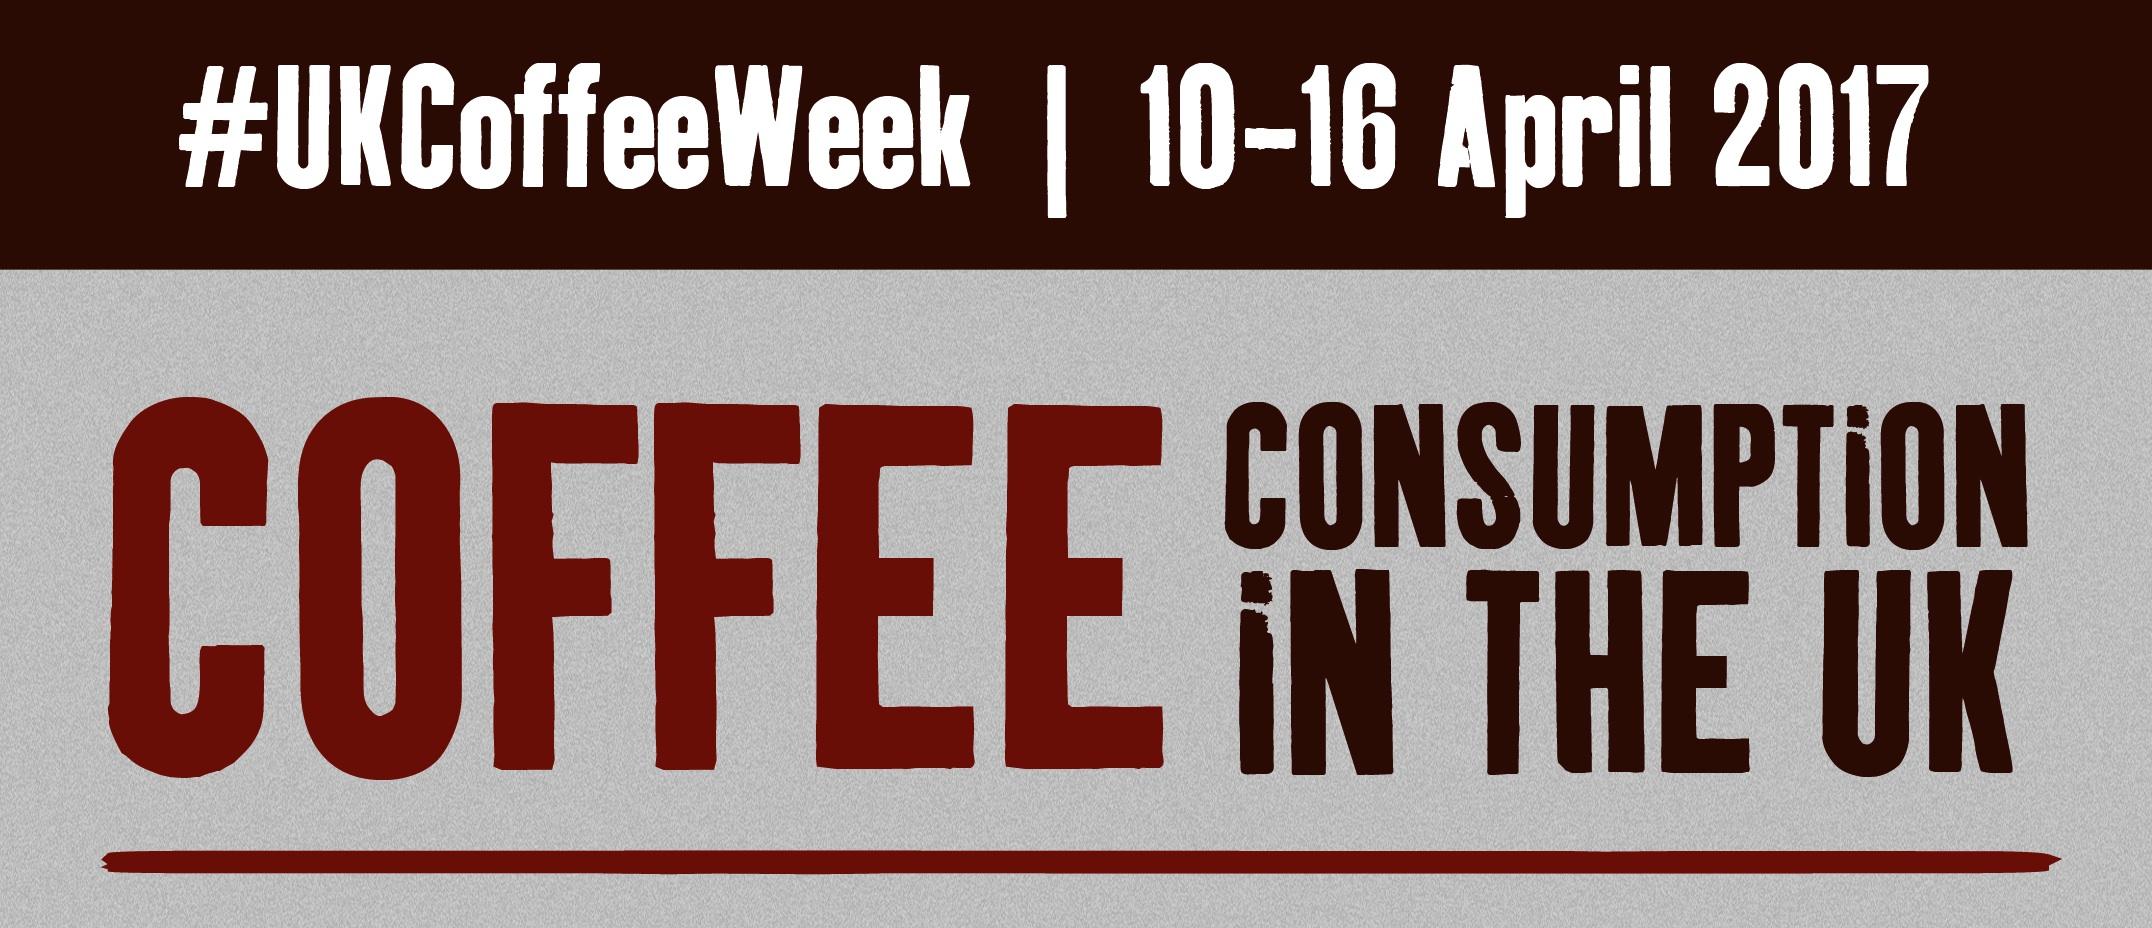 Celebrating UK Coffee Week